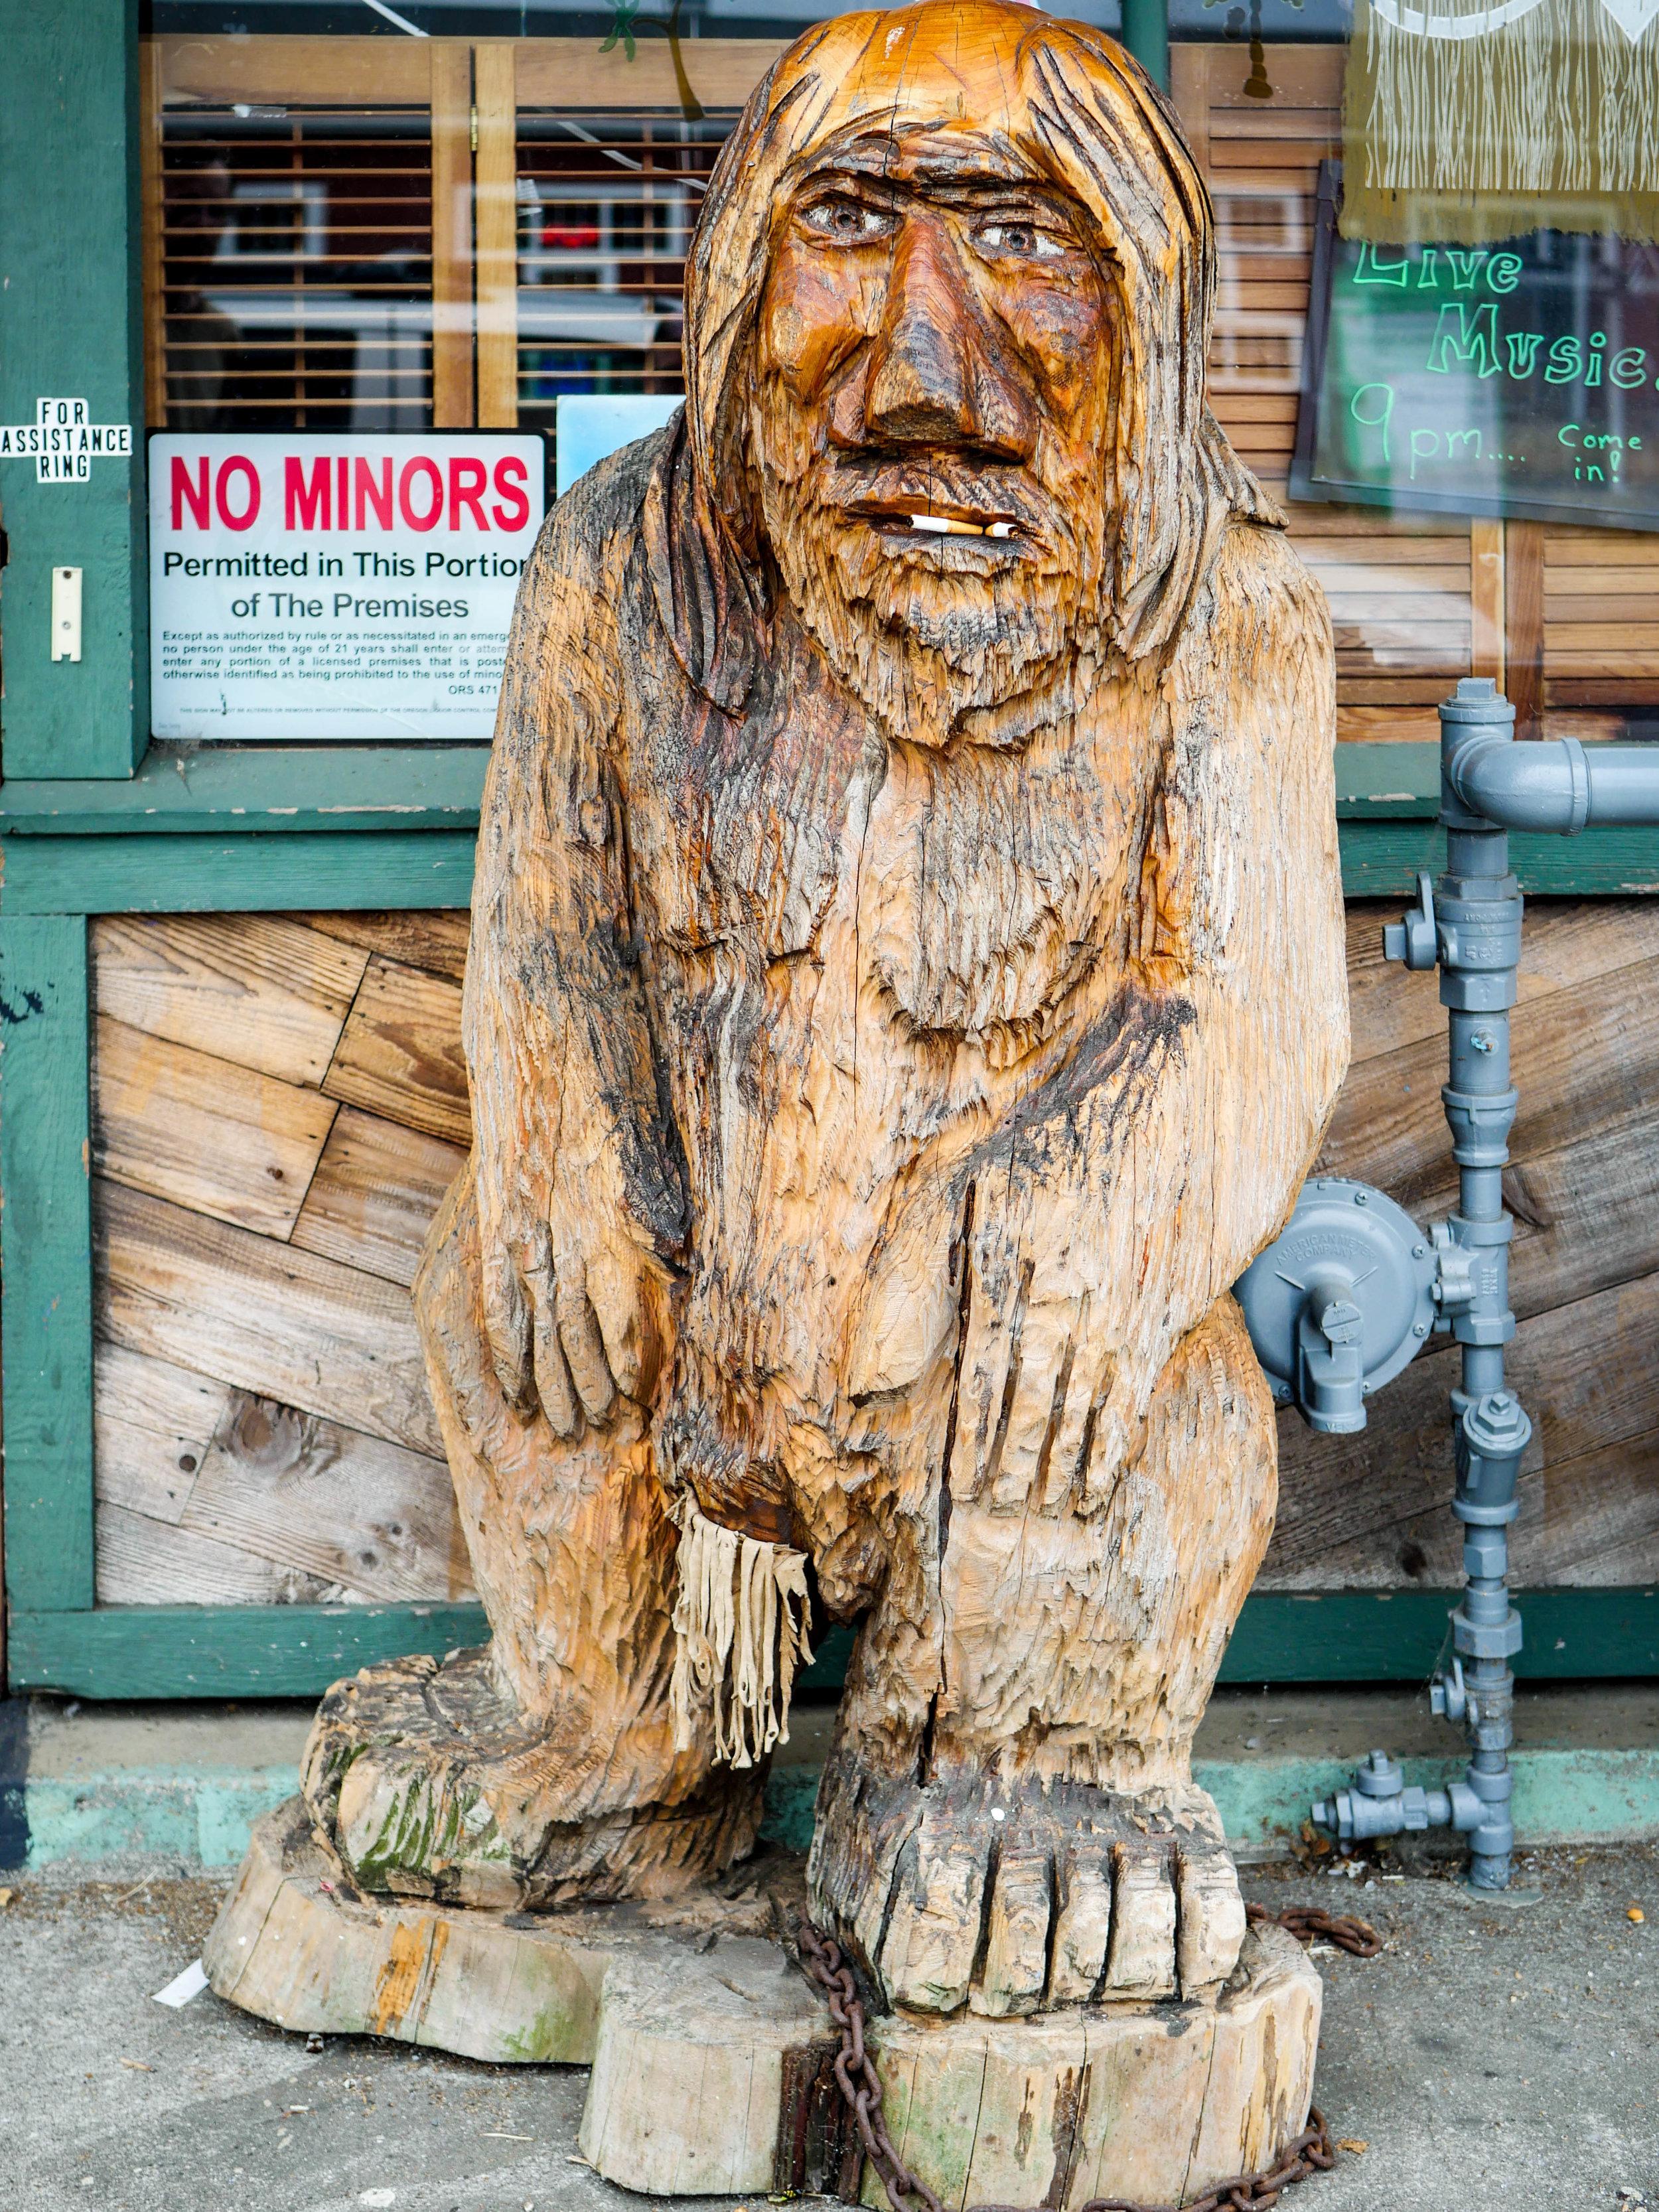 This statue.